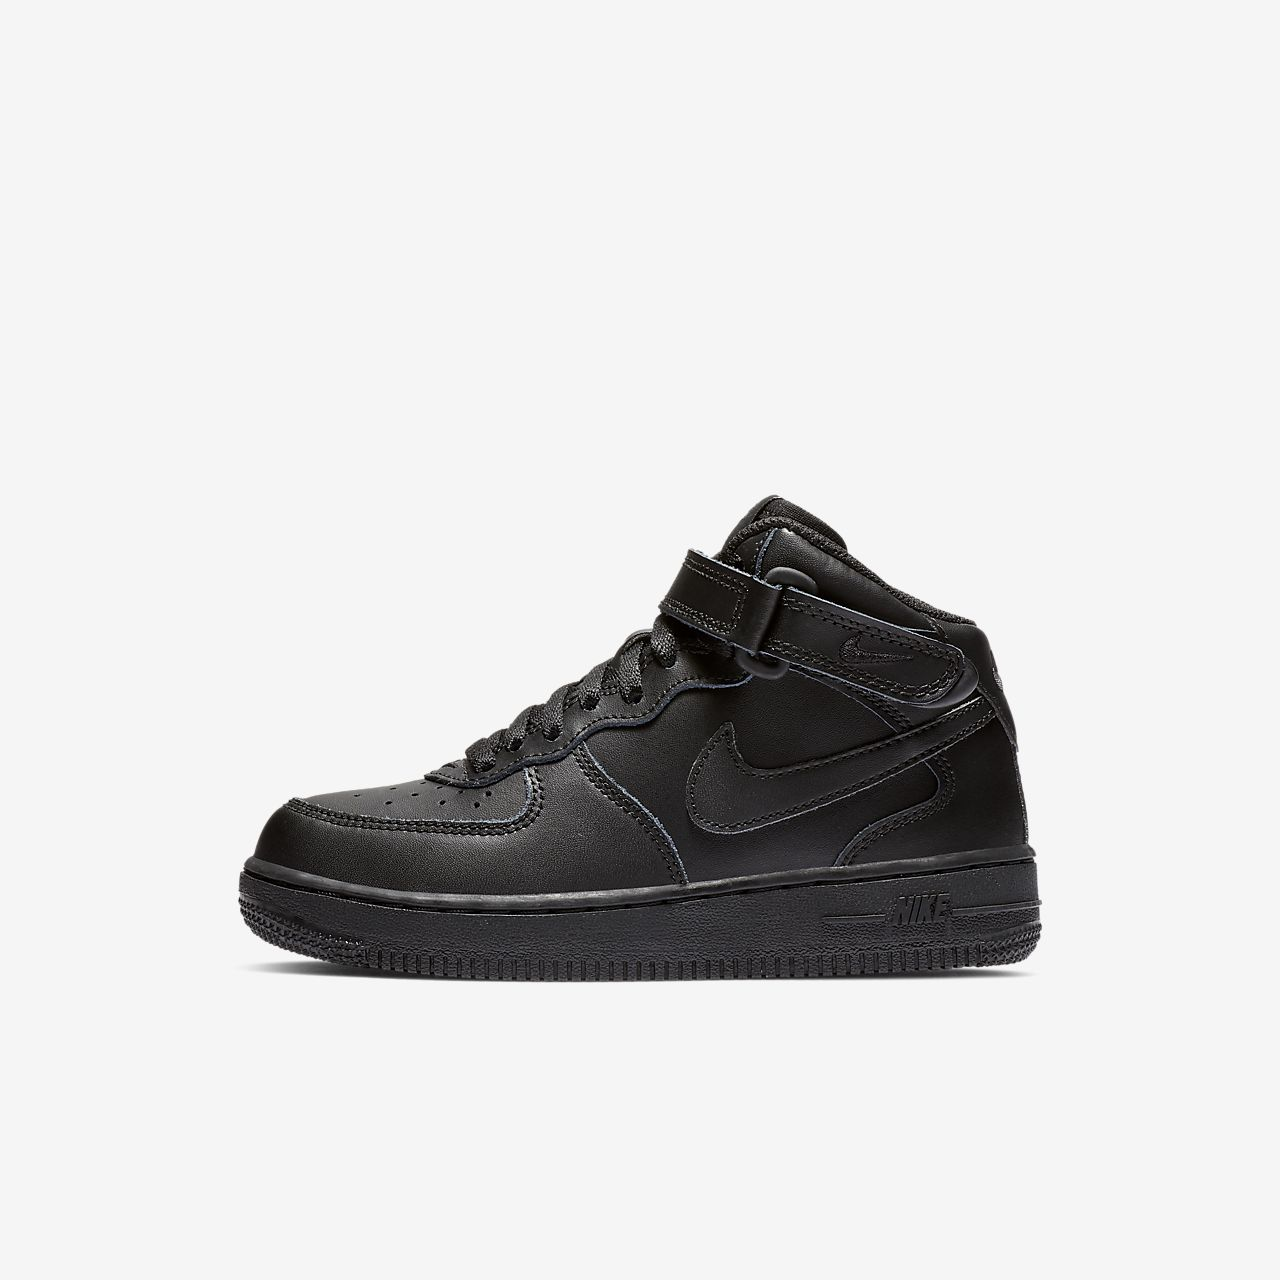 hot sale online 75833 6792c ... cheap nike air force 1 mid sko for små barn 76eef 6d99a